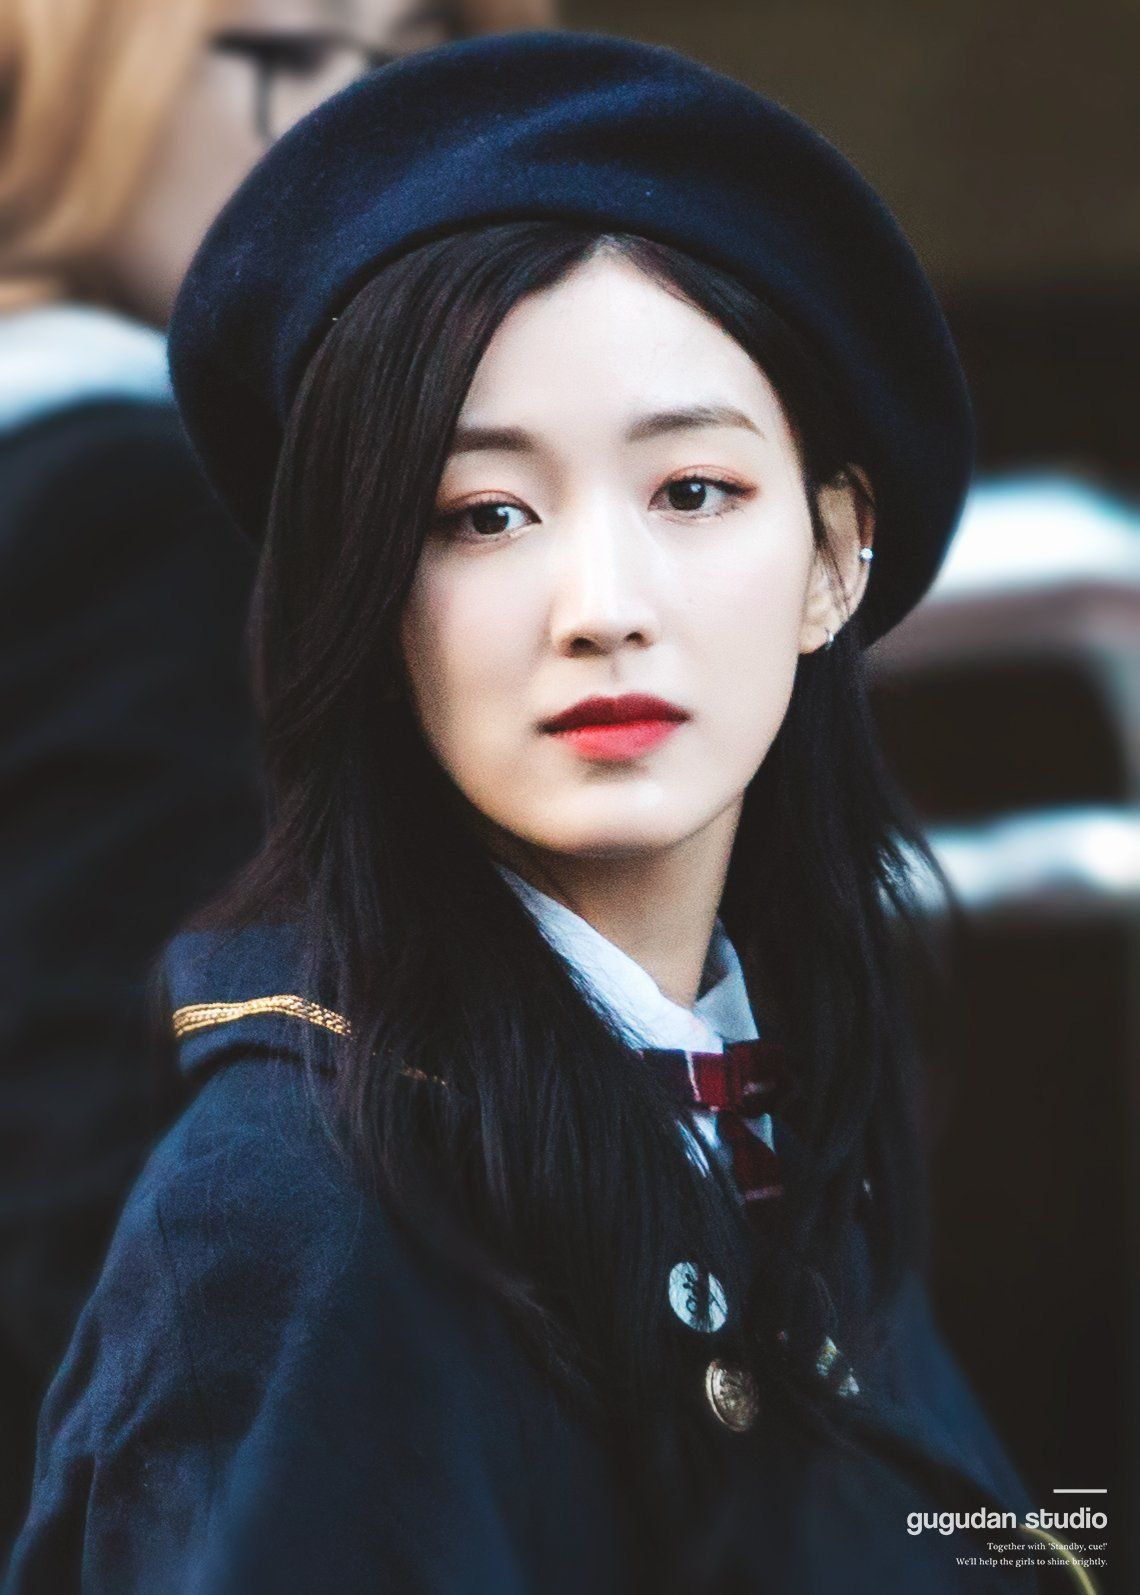 Gugudan Gu9udan Hana Korean Actresses Kpop Girls Hana